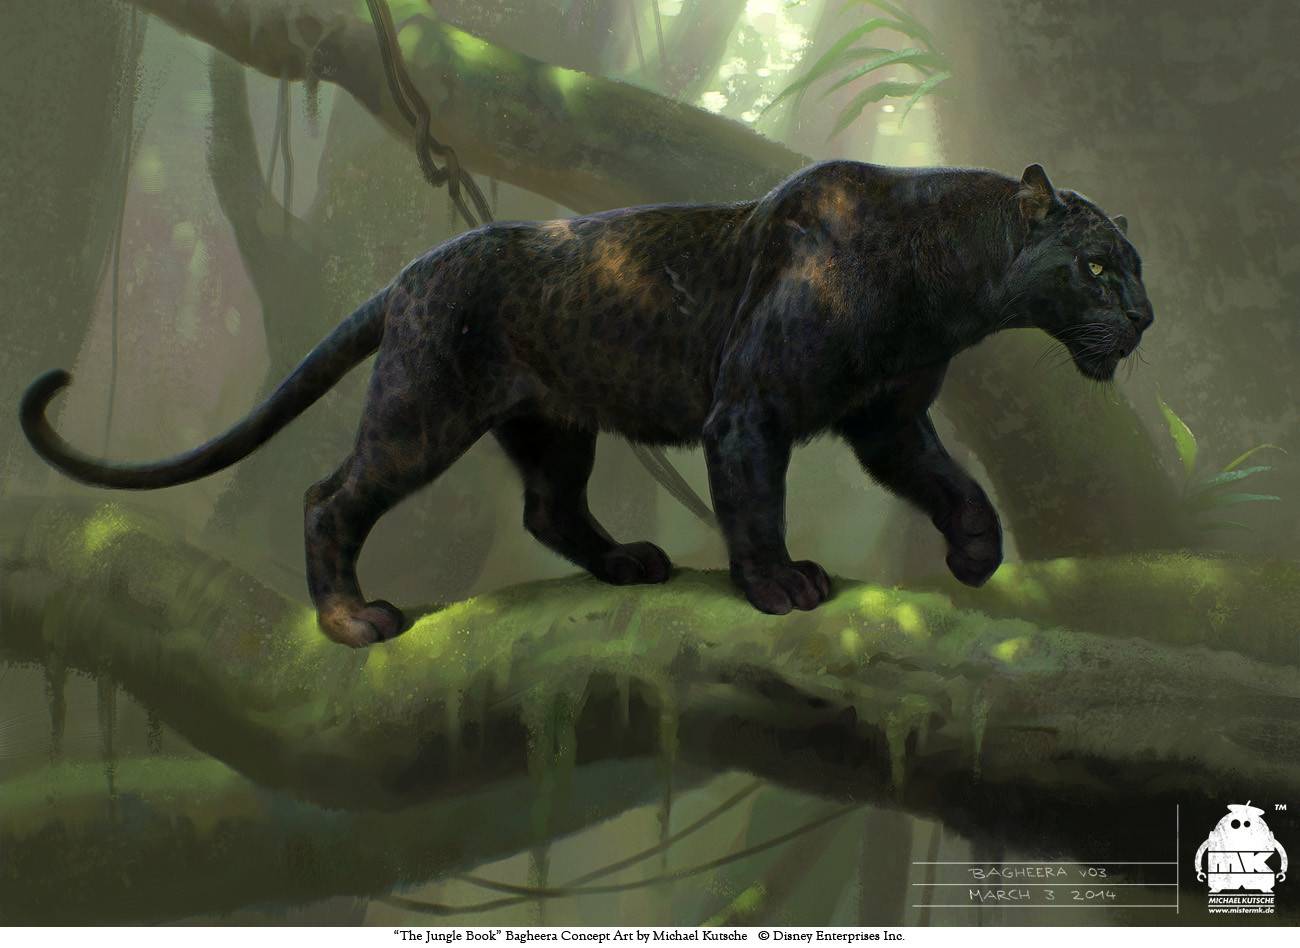 Le Livre de la Jungle [Disney - 2016] - Page 15 Michael-kutsche-bagheera-v03-by-michael-kutsche